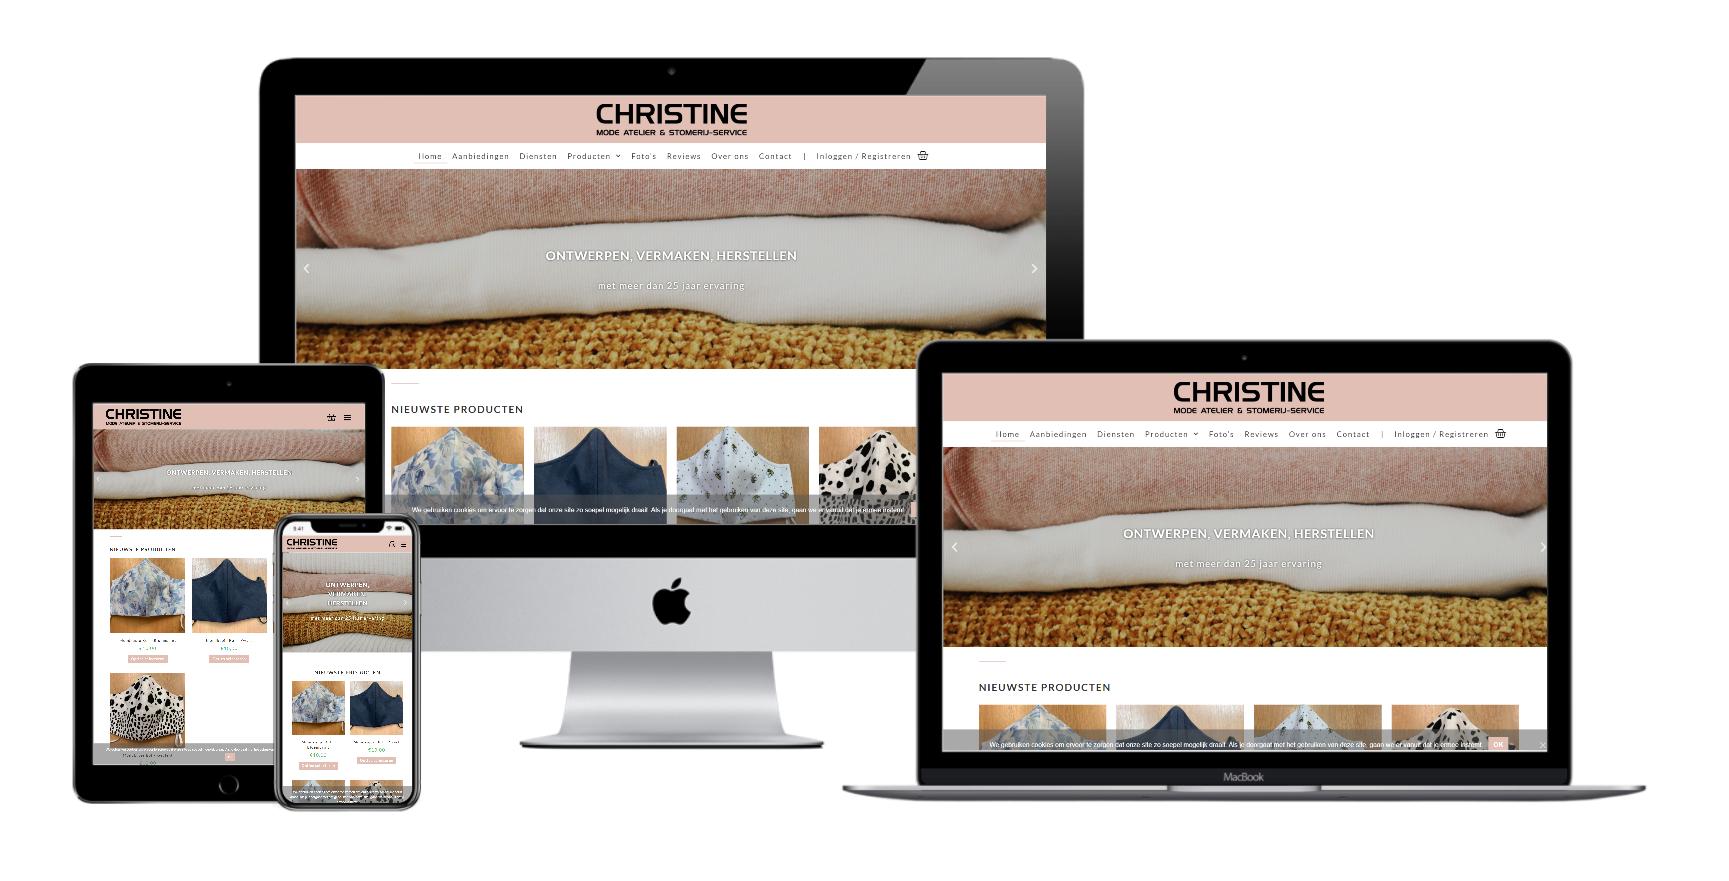 Christine Mode Atelier